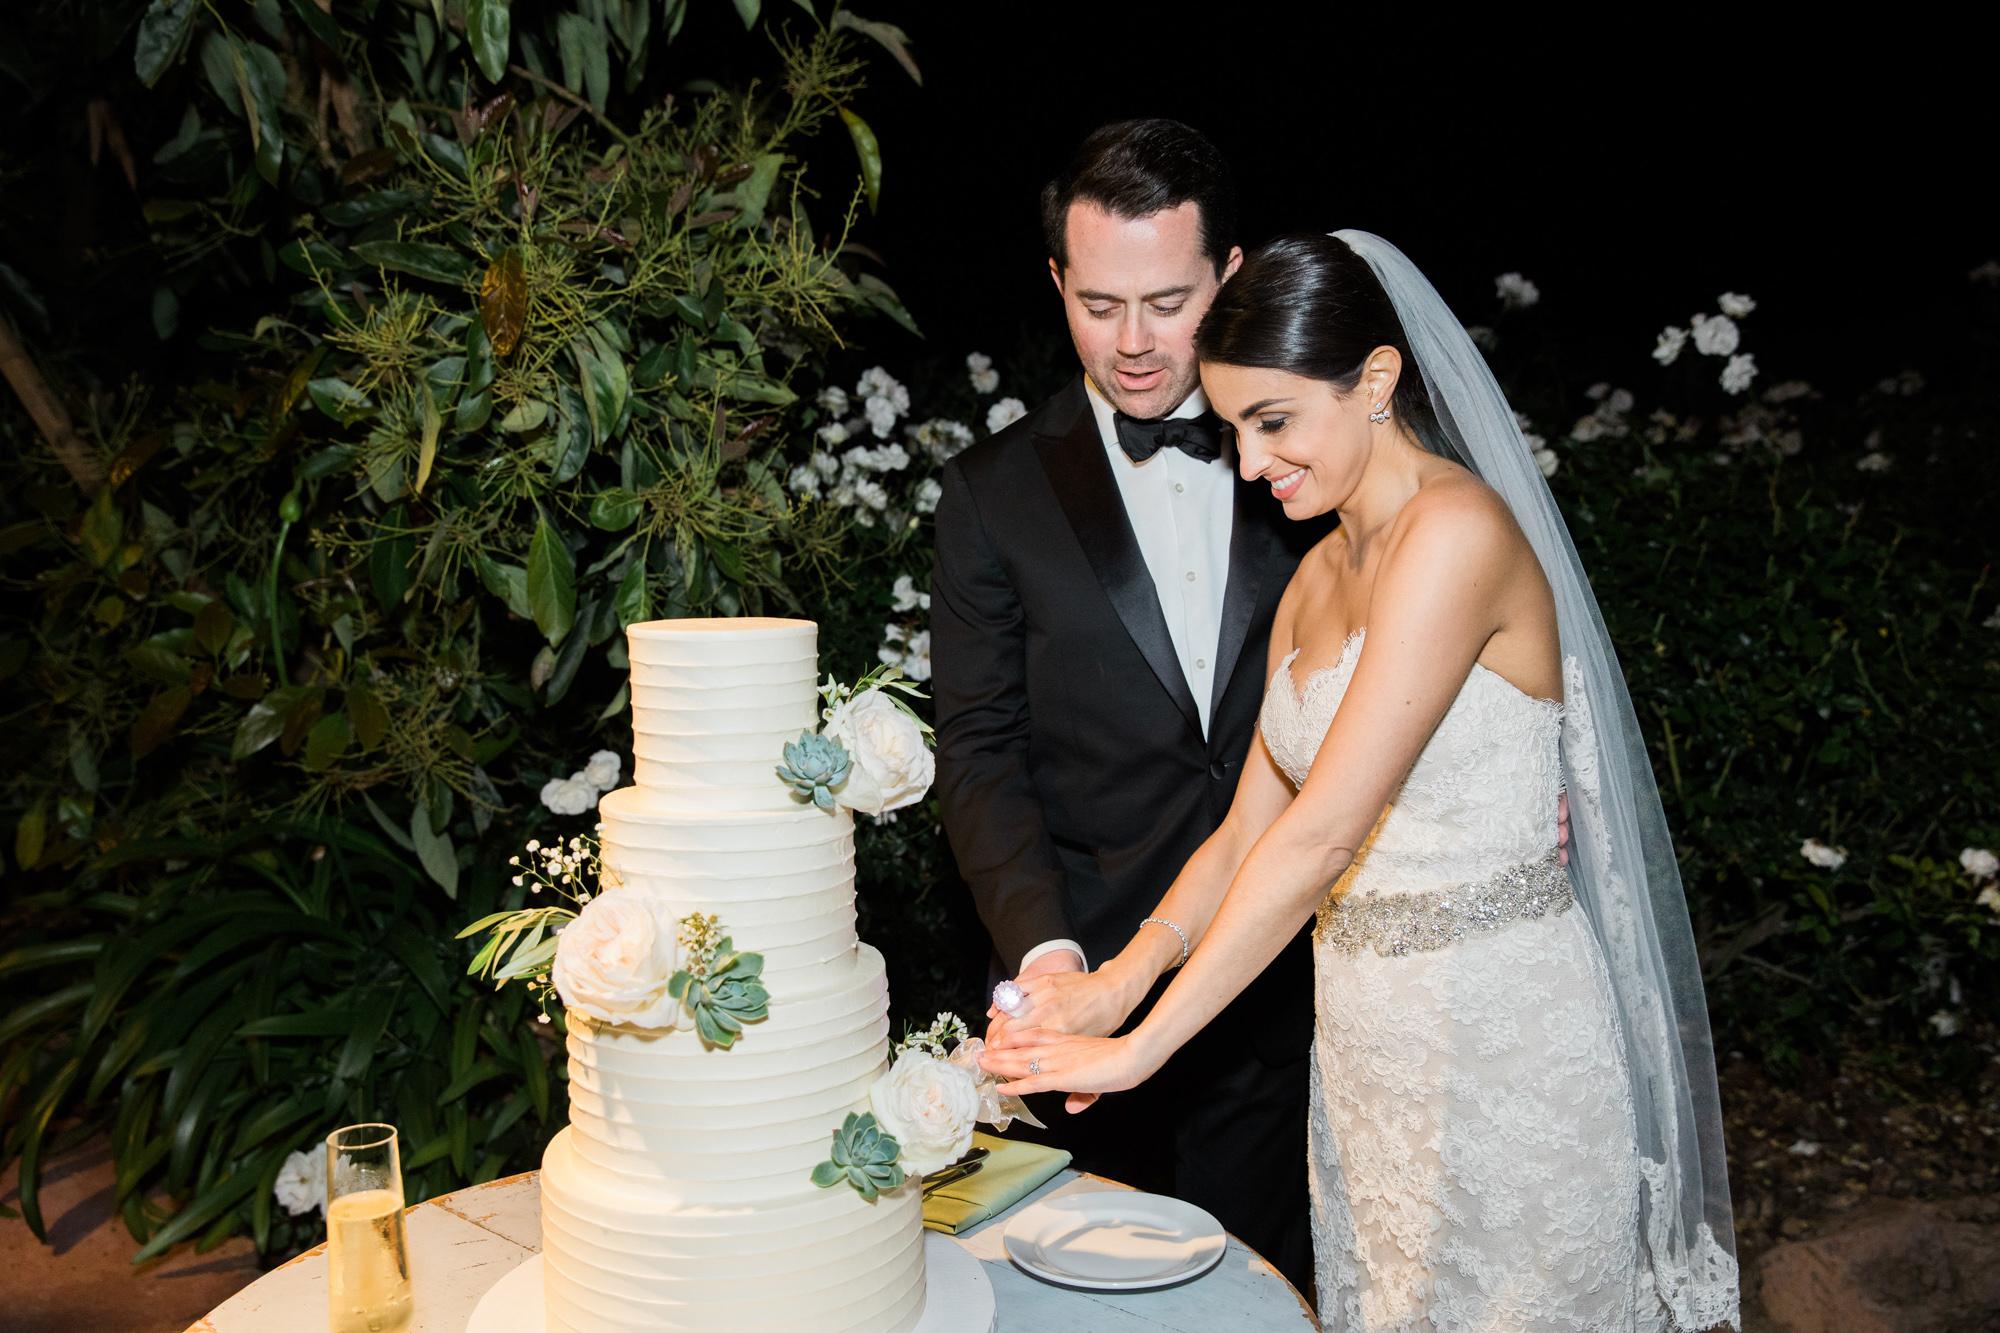 Gerry-Ranch-Wedding-Photography-Kristina-Adams-34.jpg